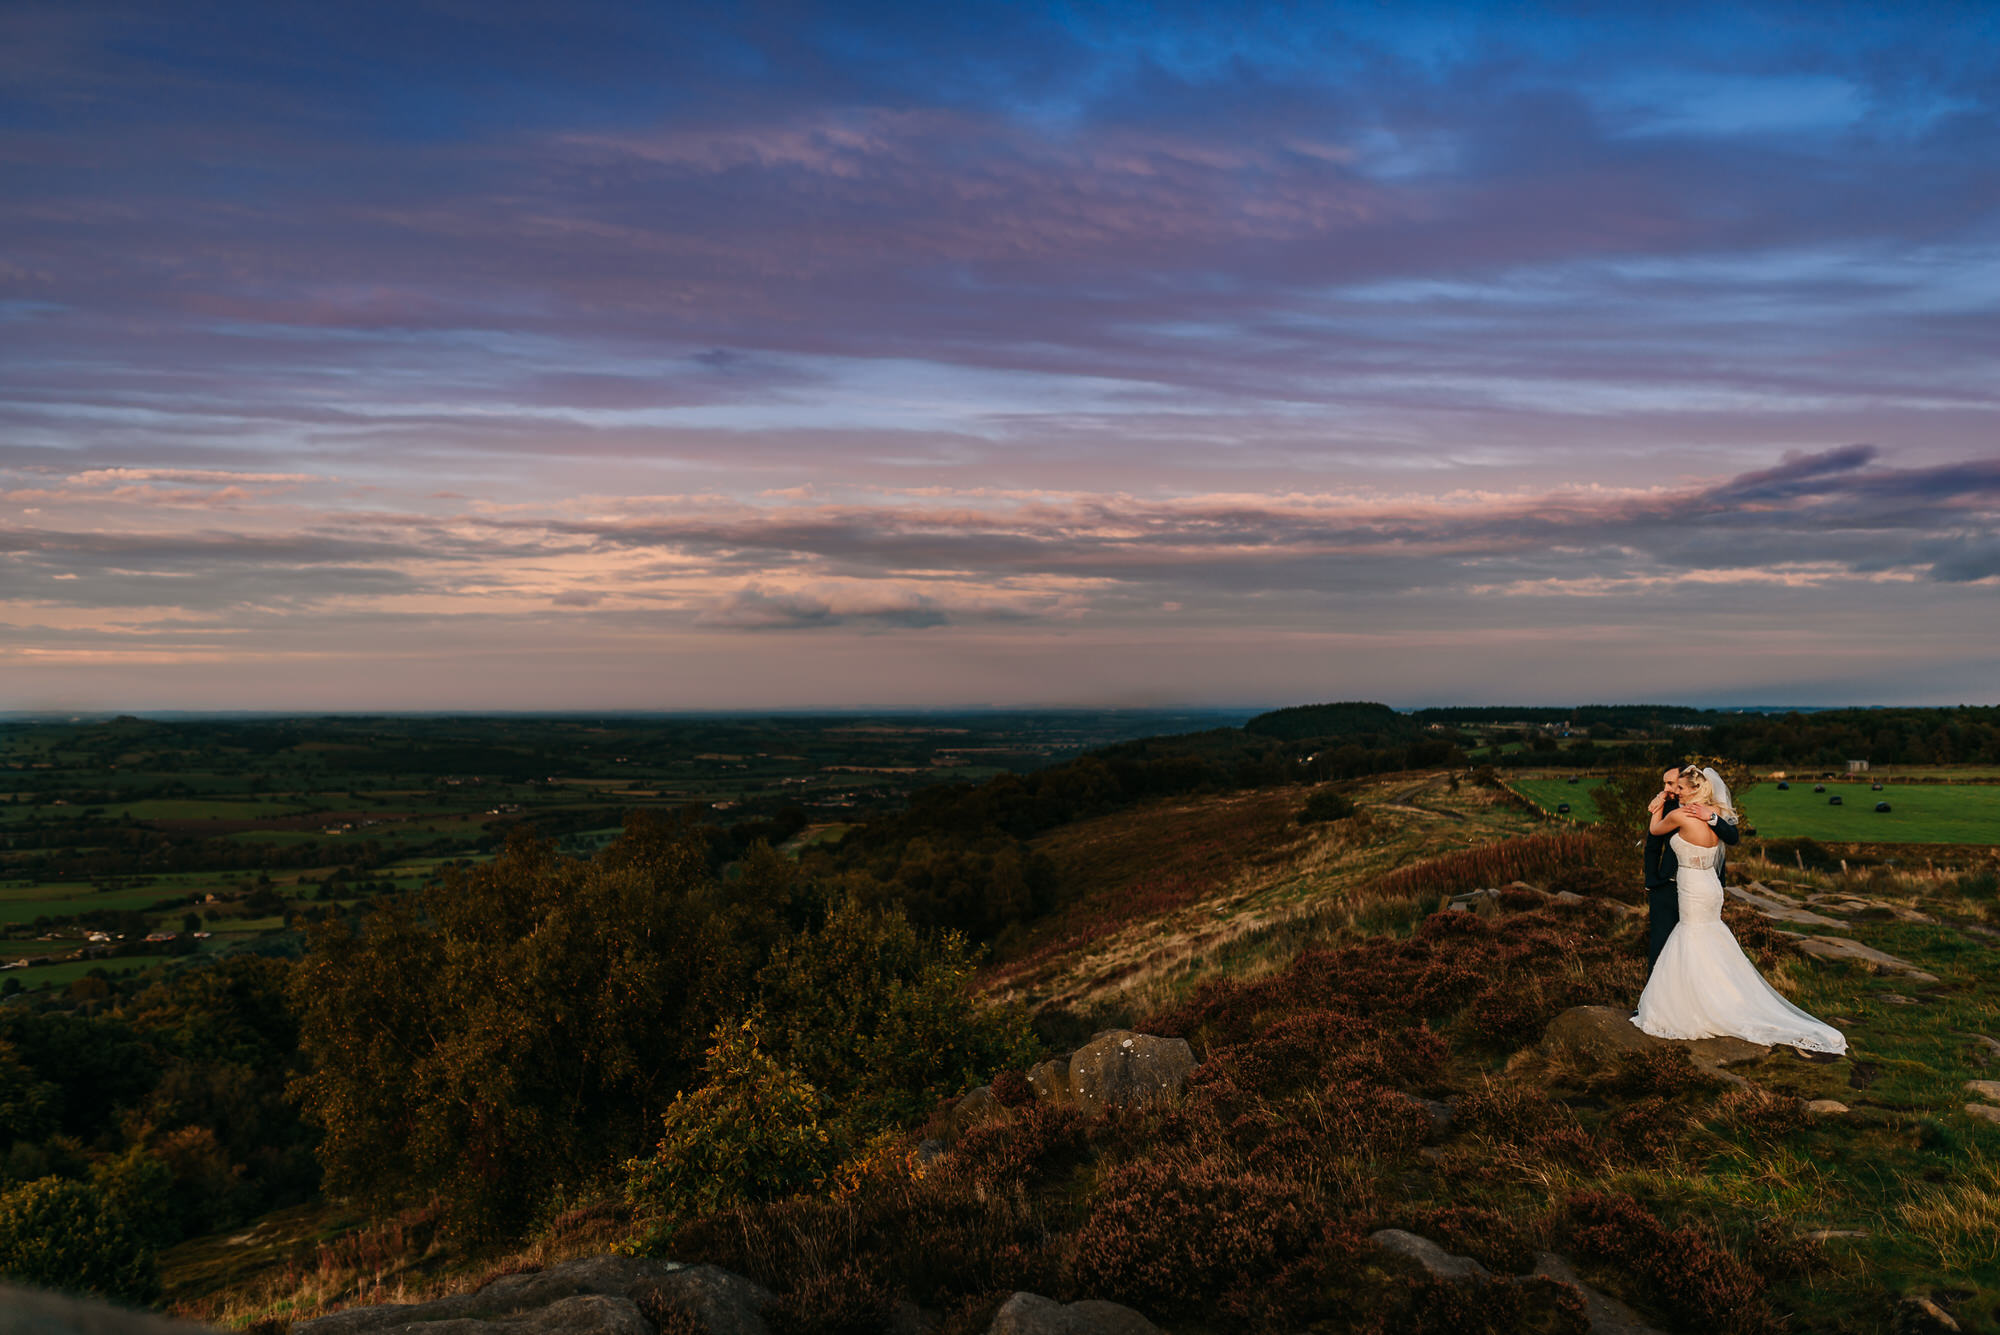 Best Of Yorkshire Wedding Photography 2017 - Martyn Hand-9.jpg